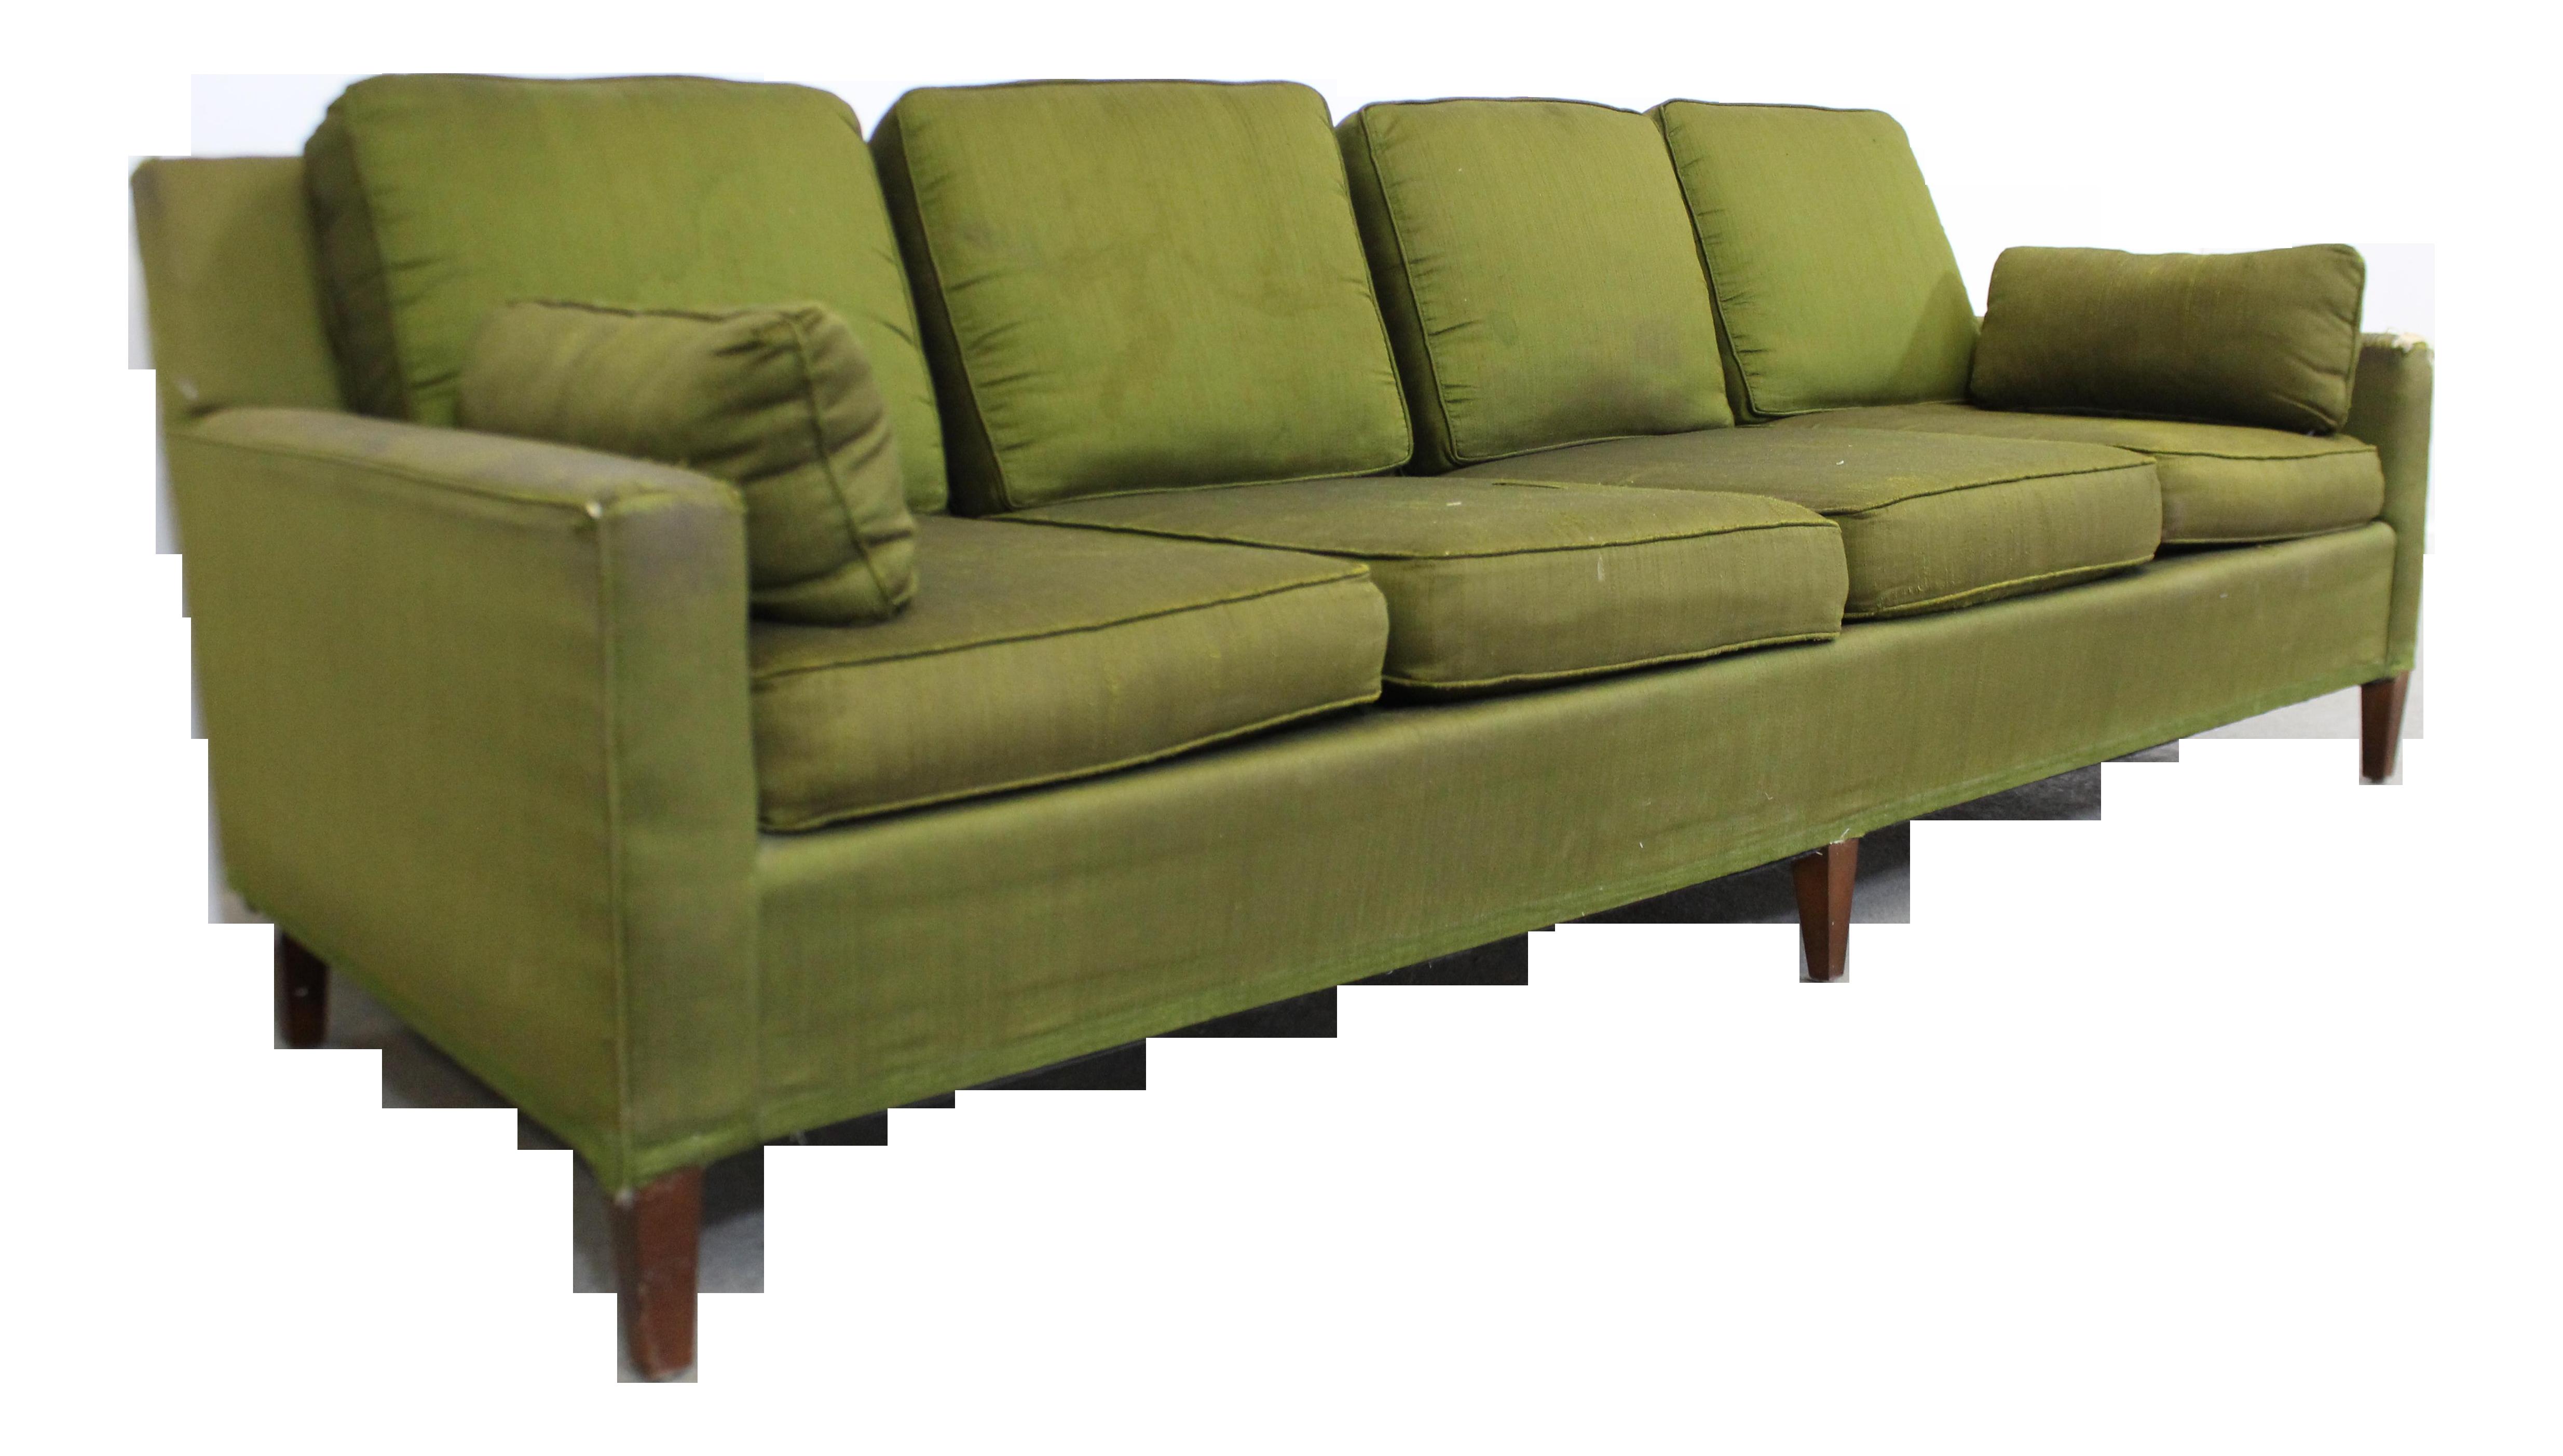 Mid-Century Modern Dunbar Style Sofa | Chairish